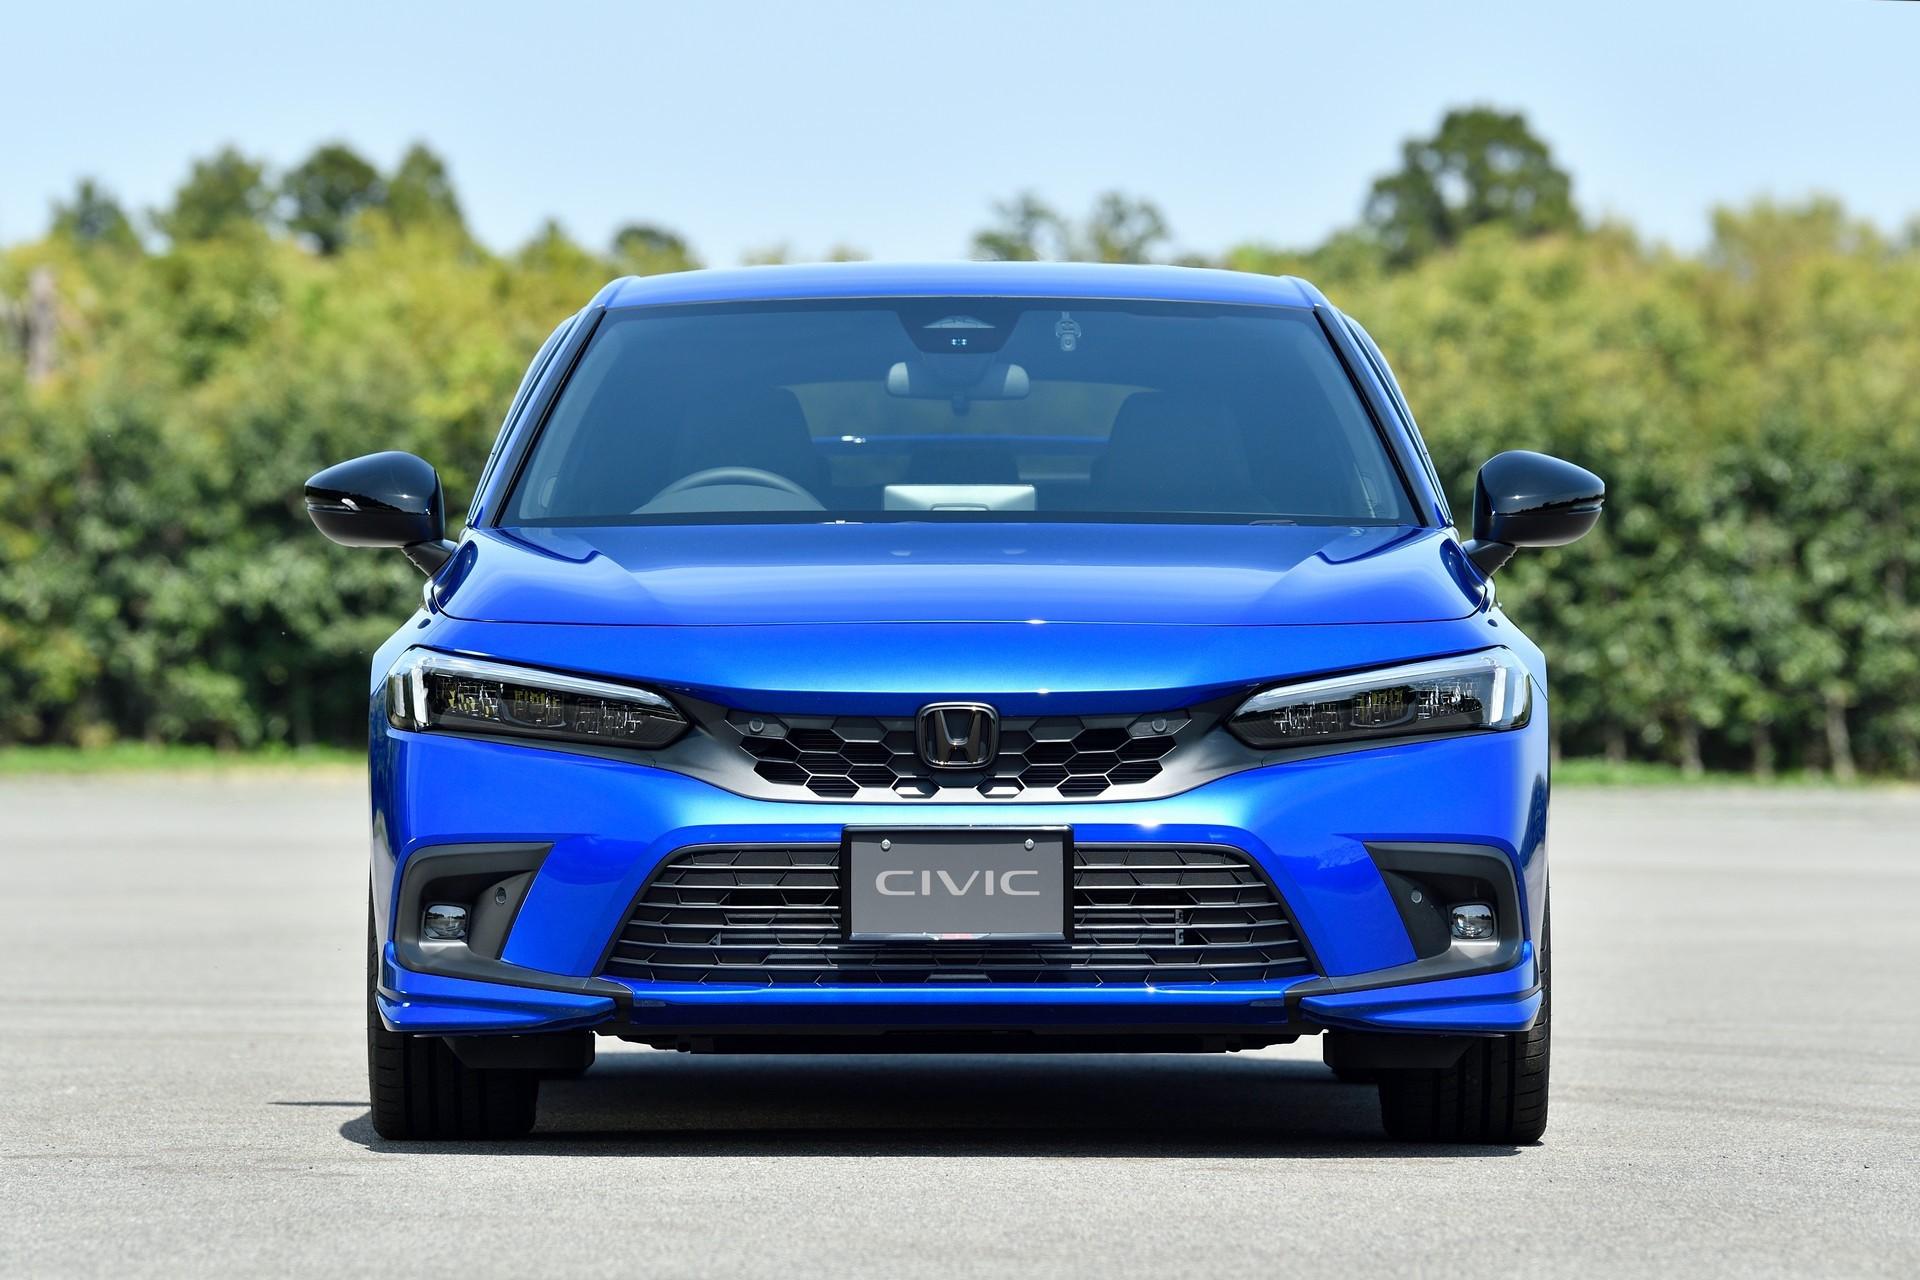 2022-Honda-Civic-Hatch-Accessories-5